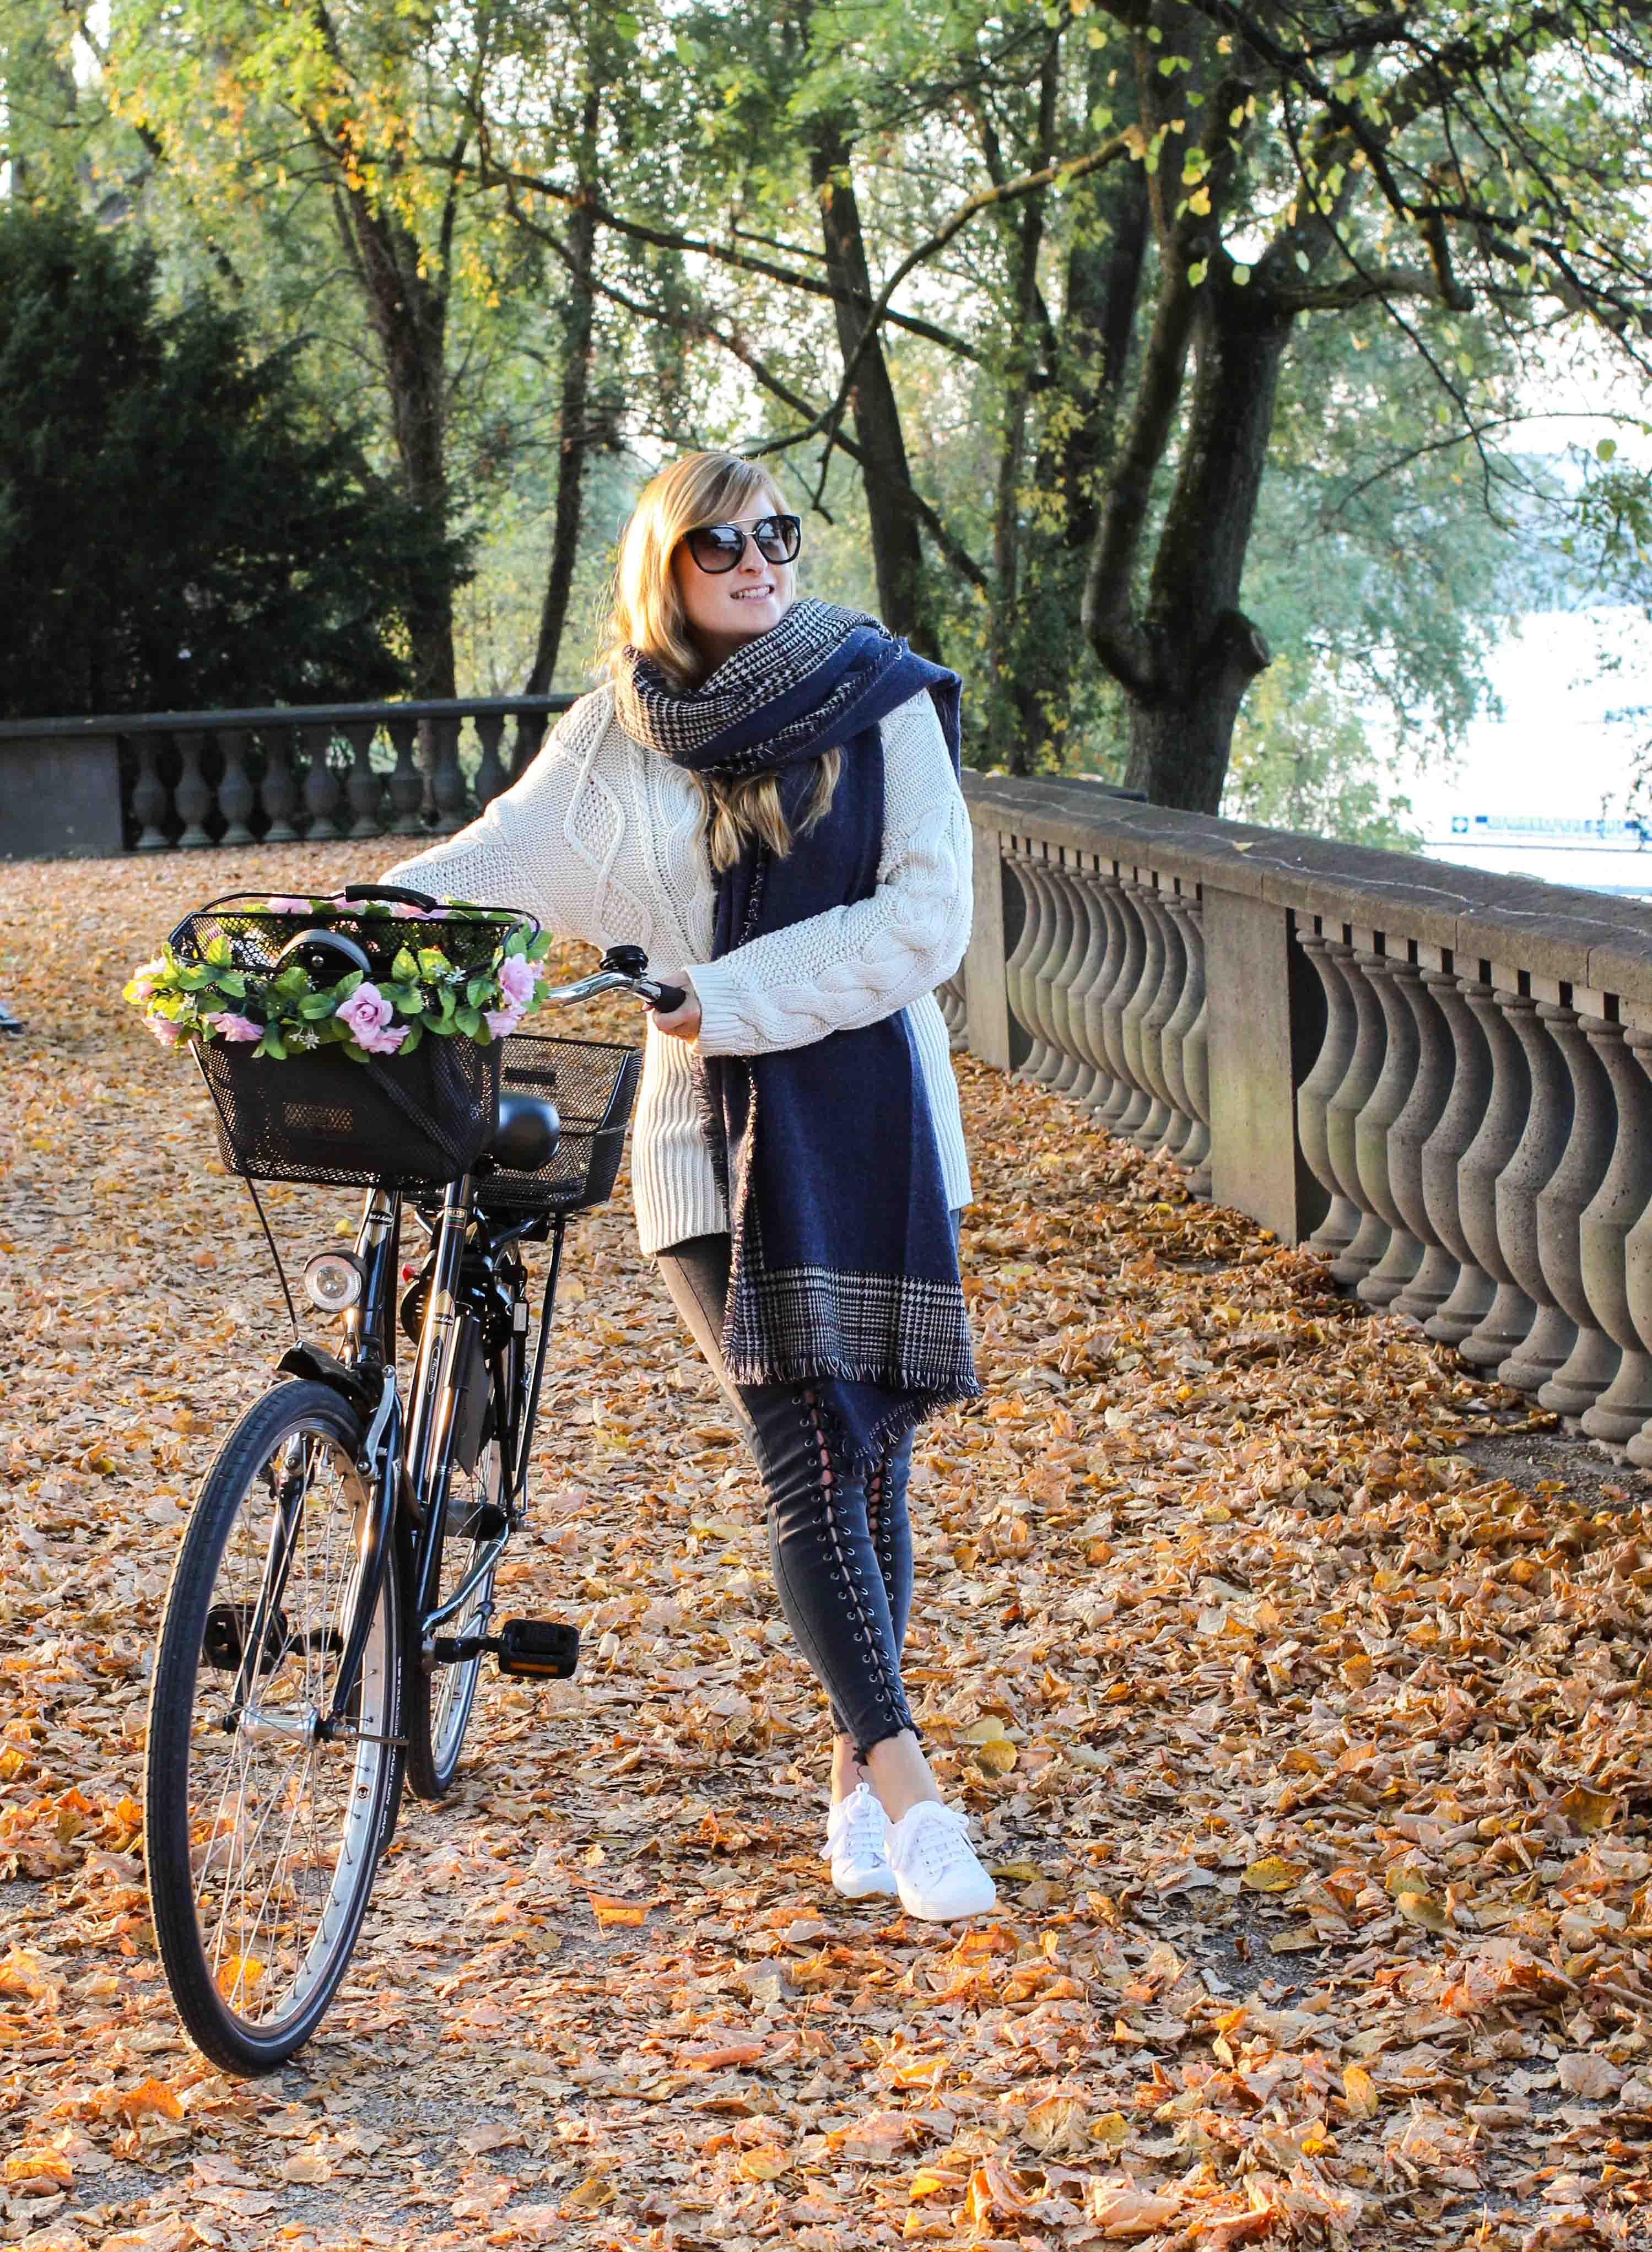 schönste Outfitfotos Herbst Foto Herbstbilder Karo Schal Herbst Must Have Trends 2019 Herbstoutfit 7